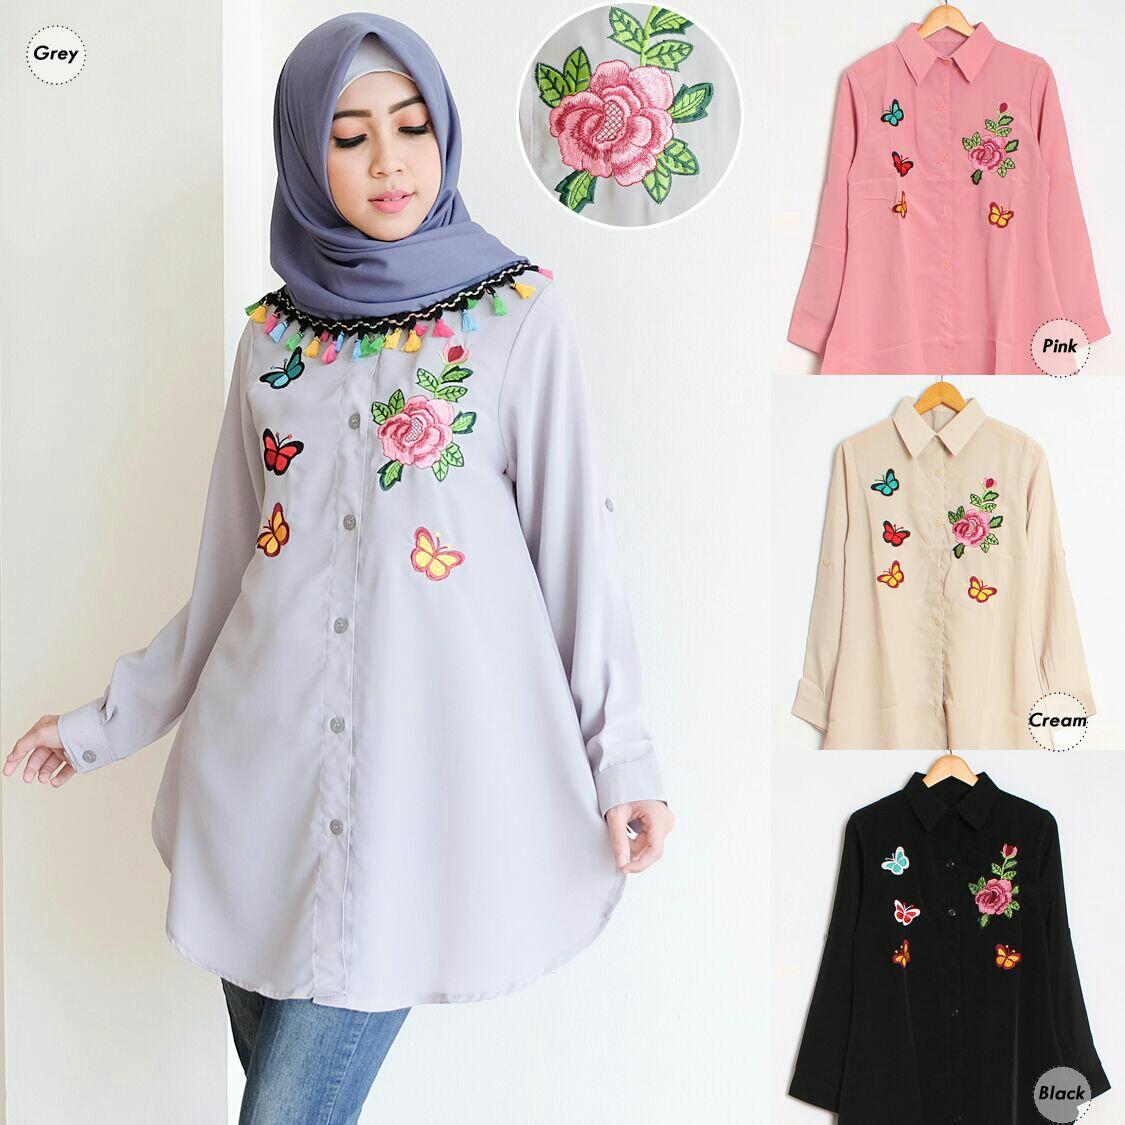 Sentra Baju Tunik Baju Wanita Dewasa Katalog Katalog Baju Wanita Sentra Baju Bandung Sentra